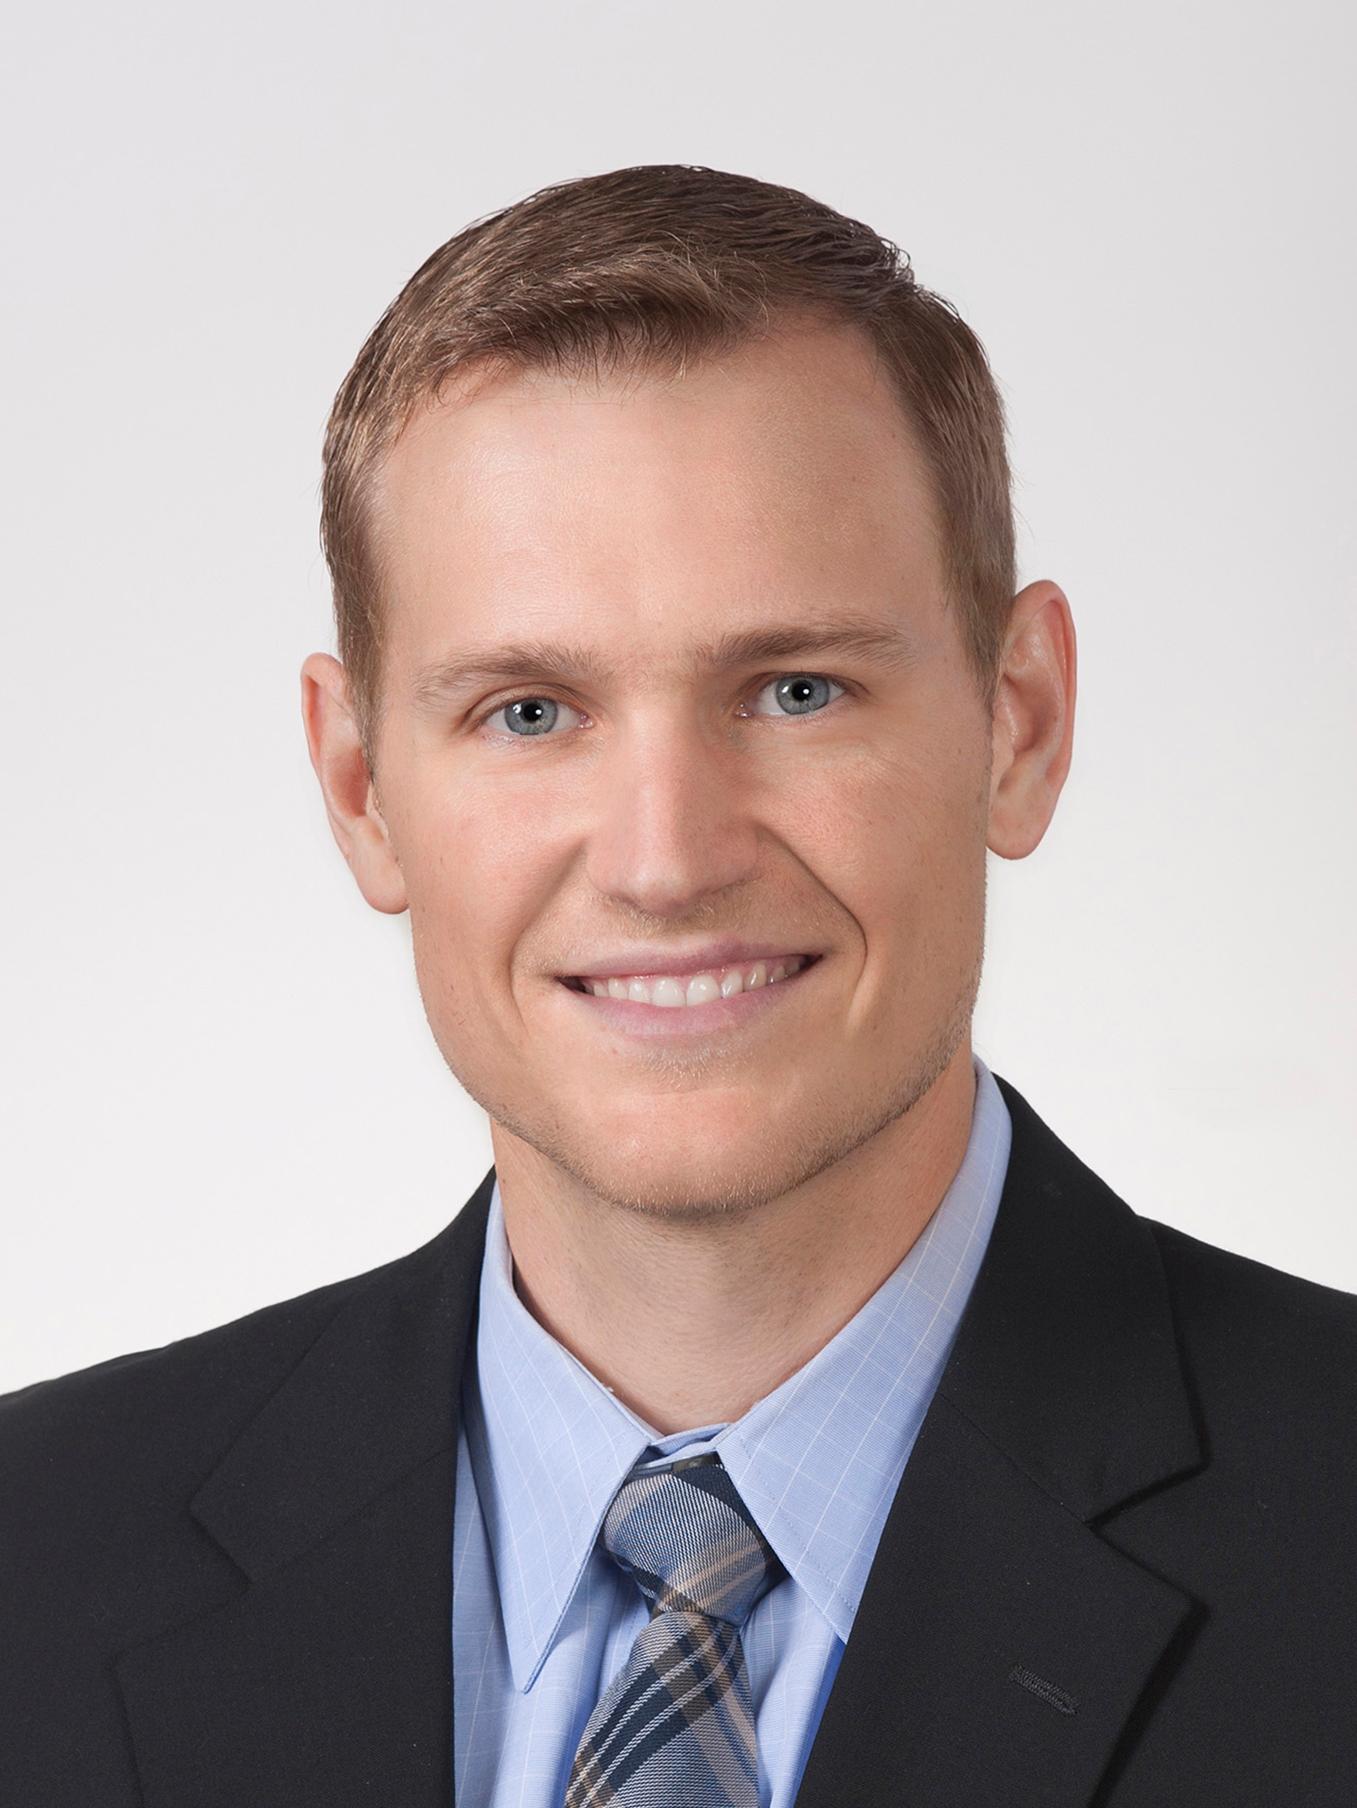 Regan S. Teague, Portfolio Manager and Advisor at Day Hagan Mutual Funds in Sarasota, FL.